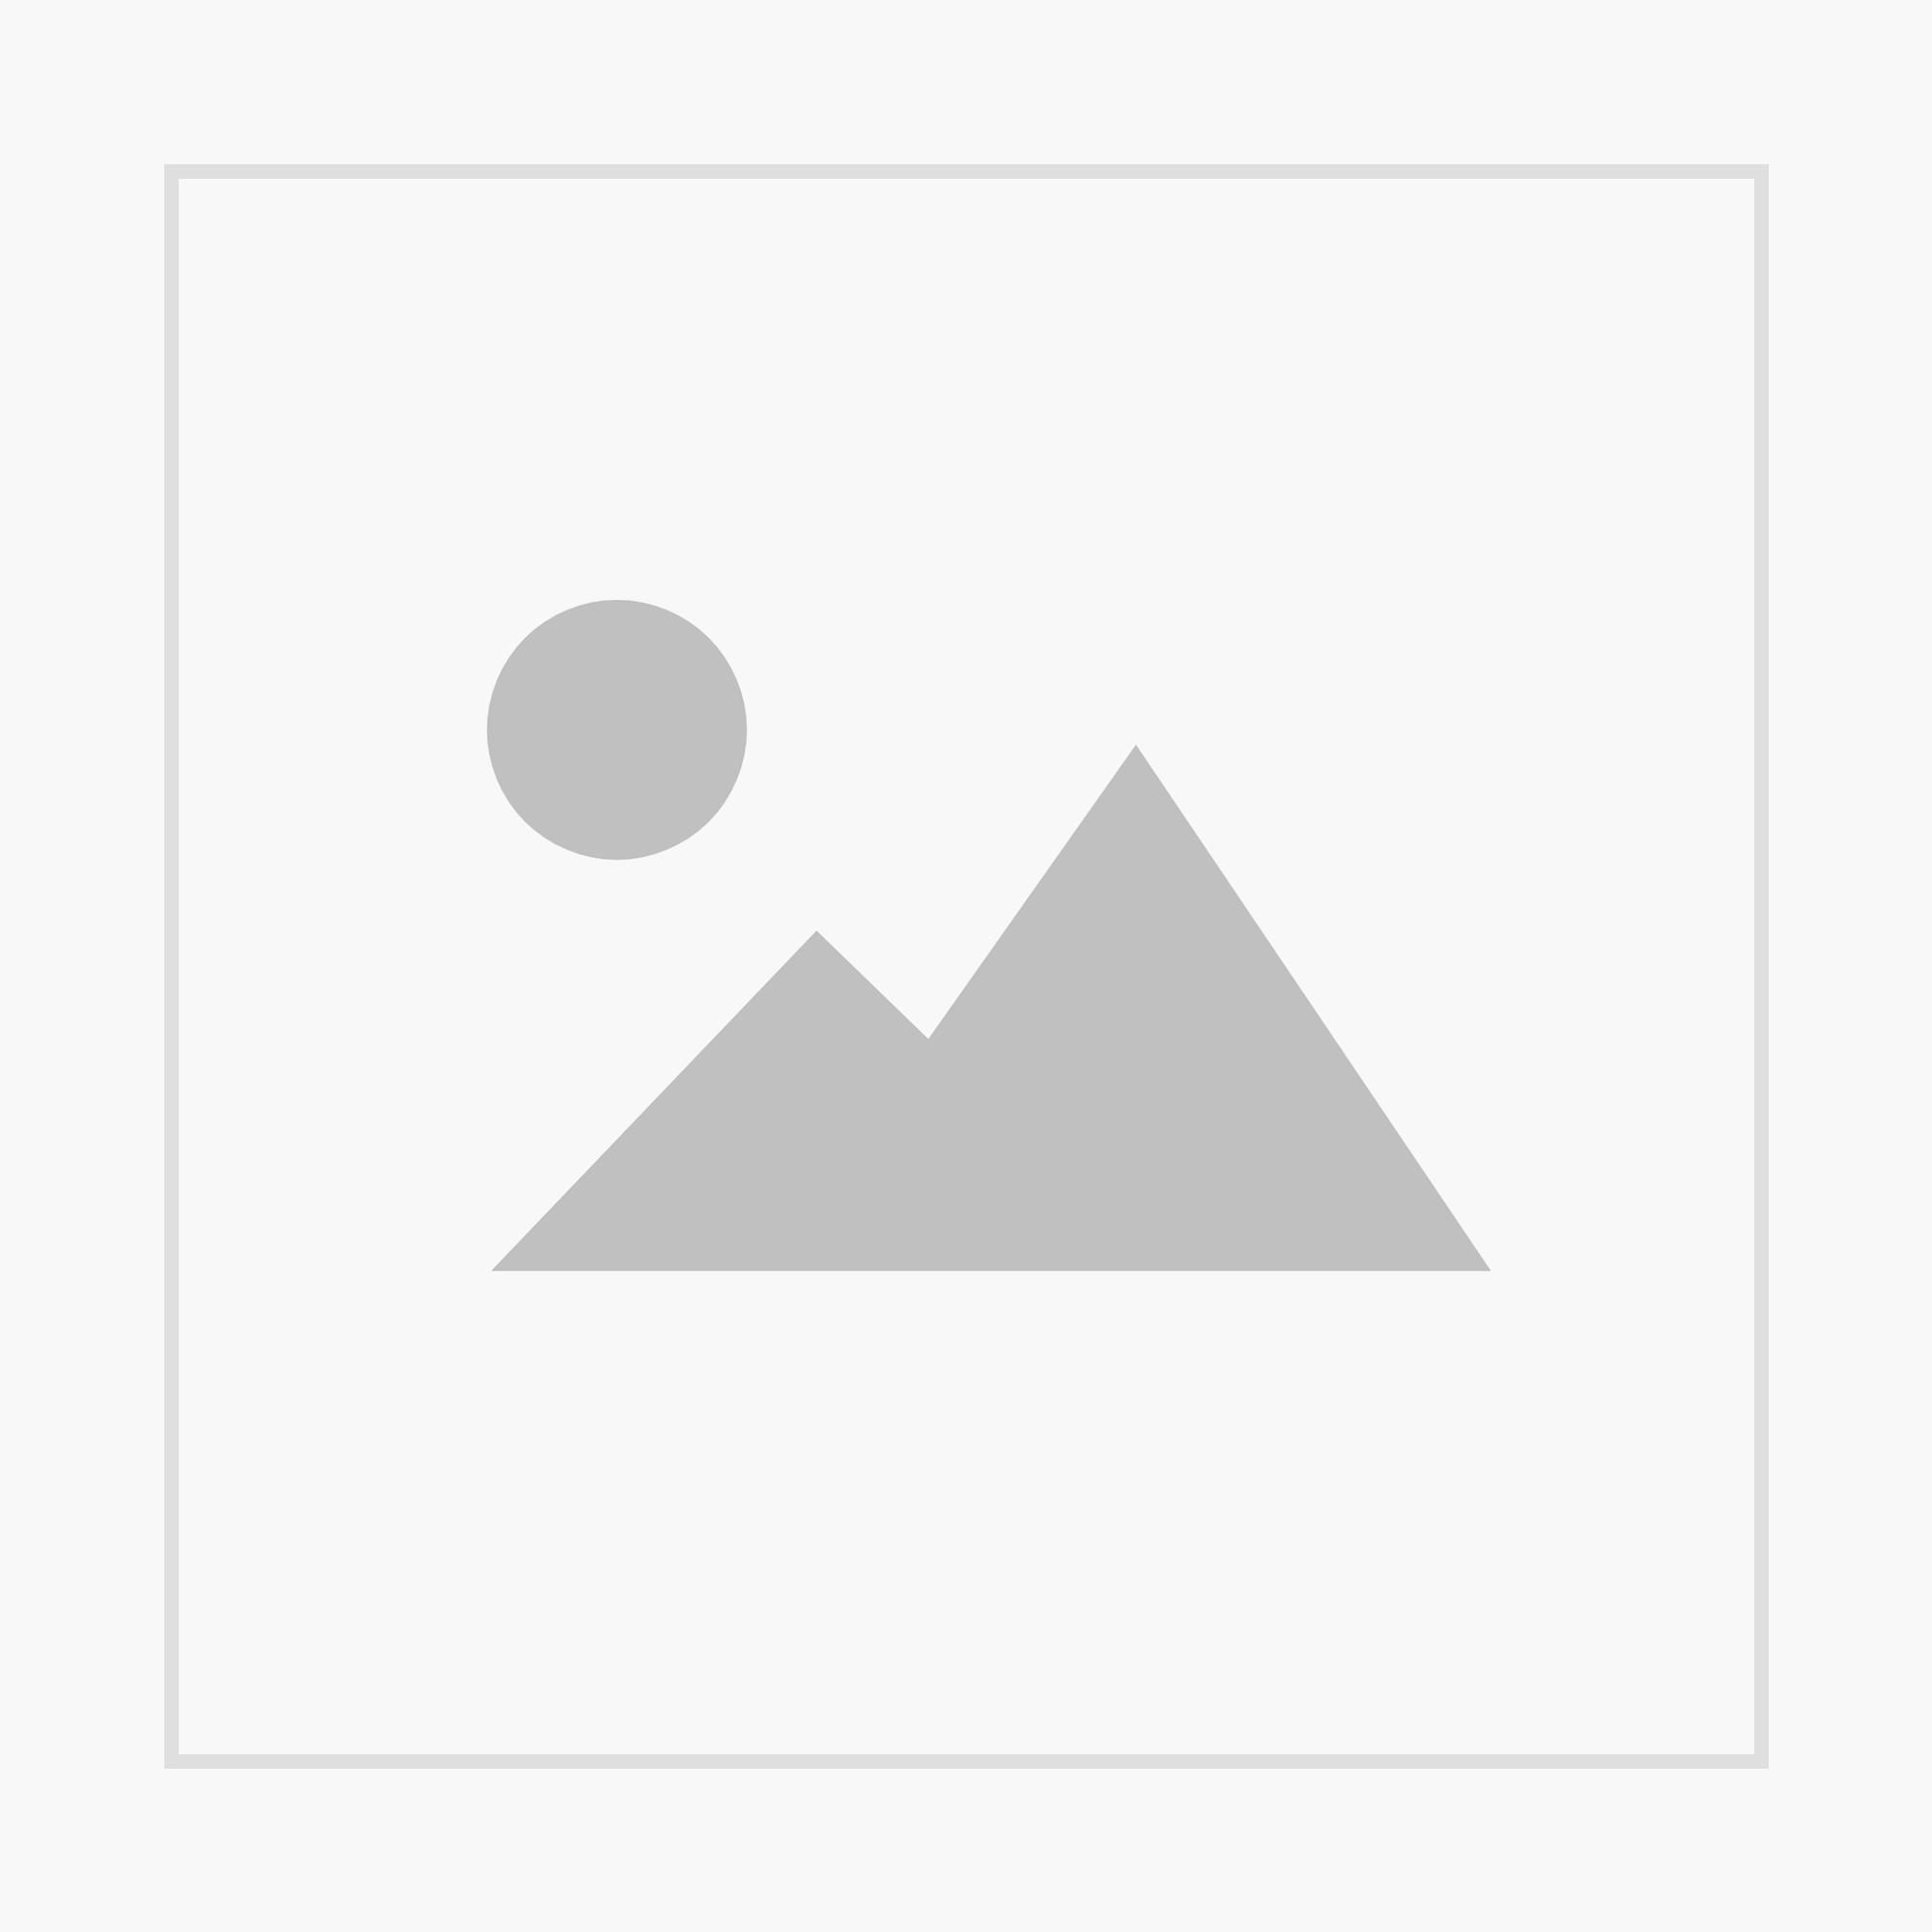 NaBiV Heft 167: Natura 2000 Forest habitat types on secondary sites